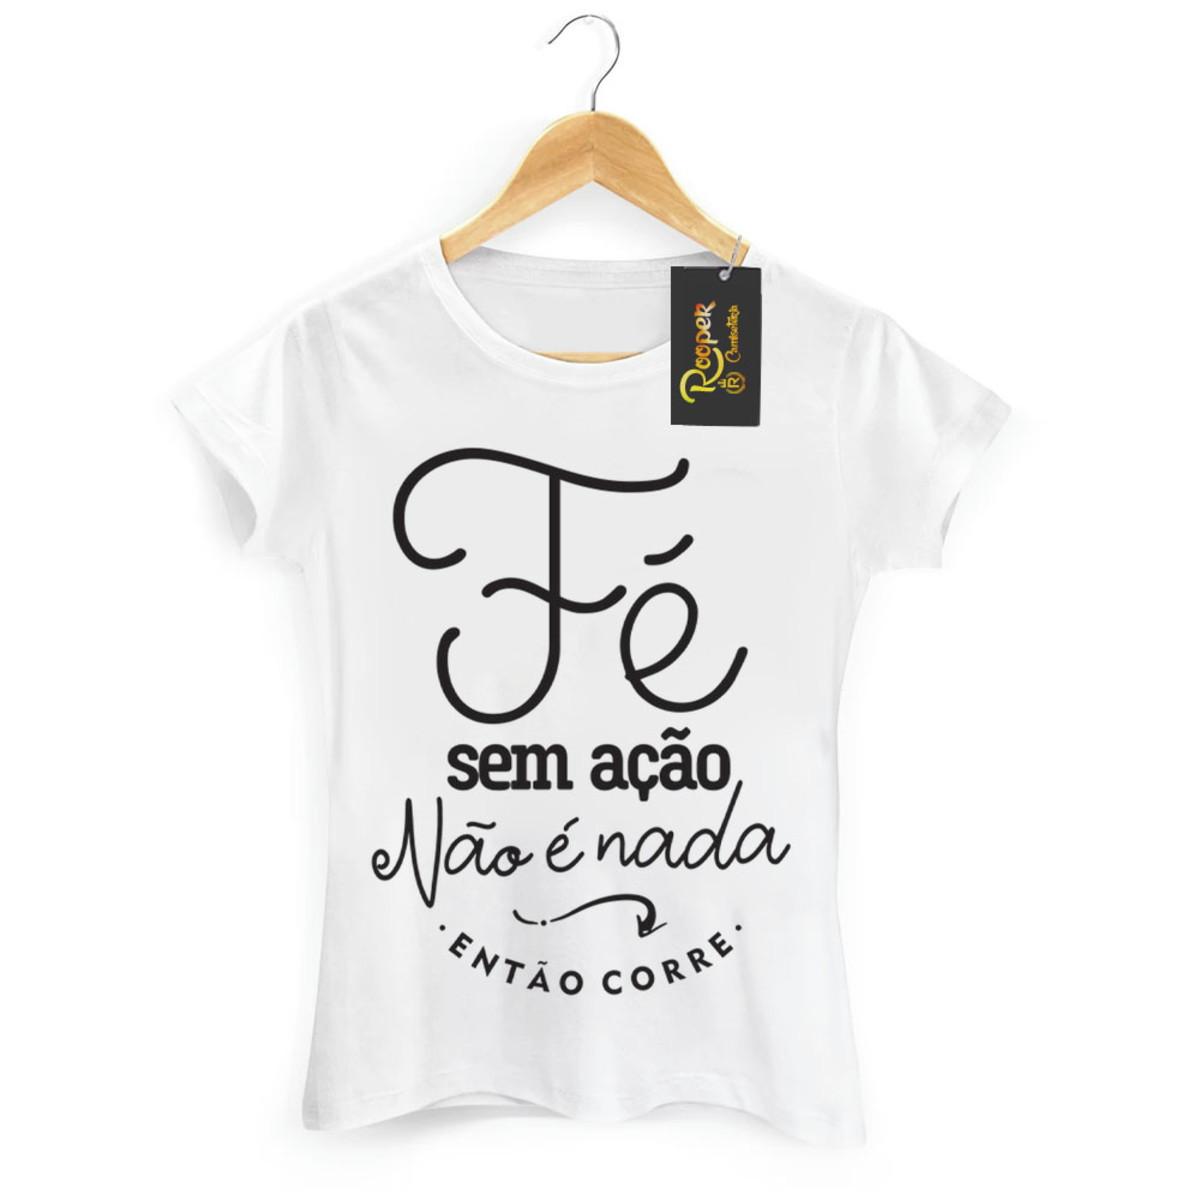 70c4d082b3 Camiseta Evangelica Feminina Fé no Elo7